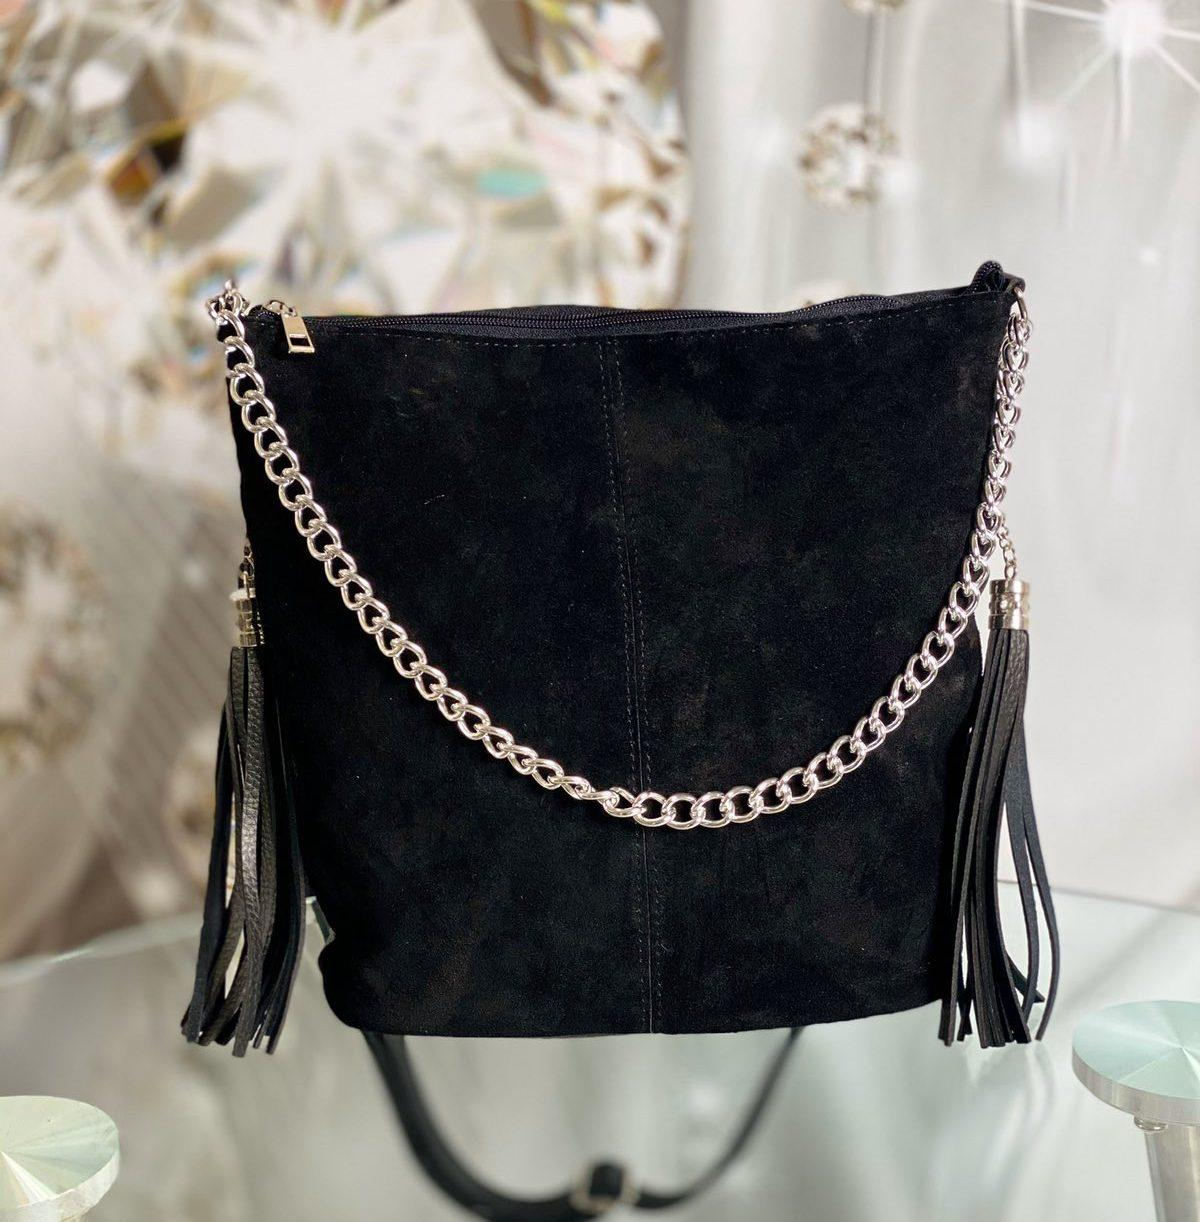 Черная замшевая сумка мешок женская на плечо вместительная замшевая женская натуральная замша+кожзам